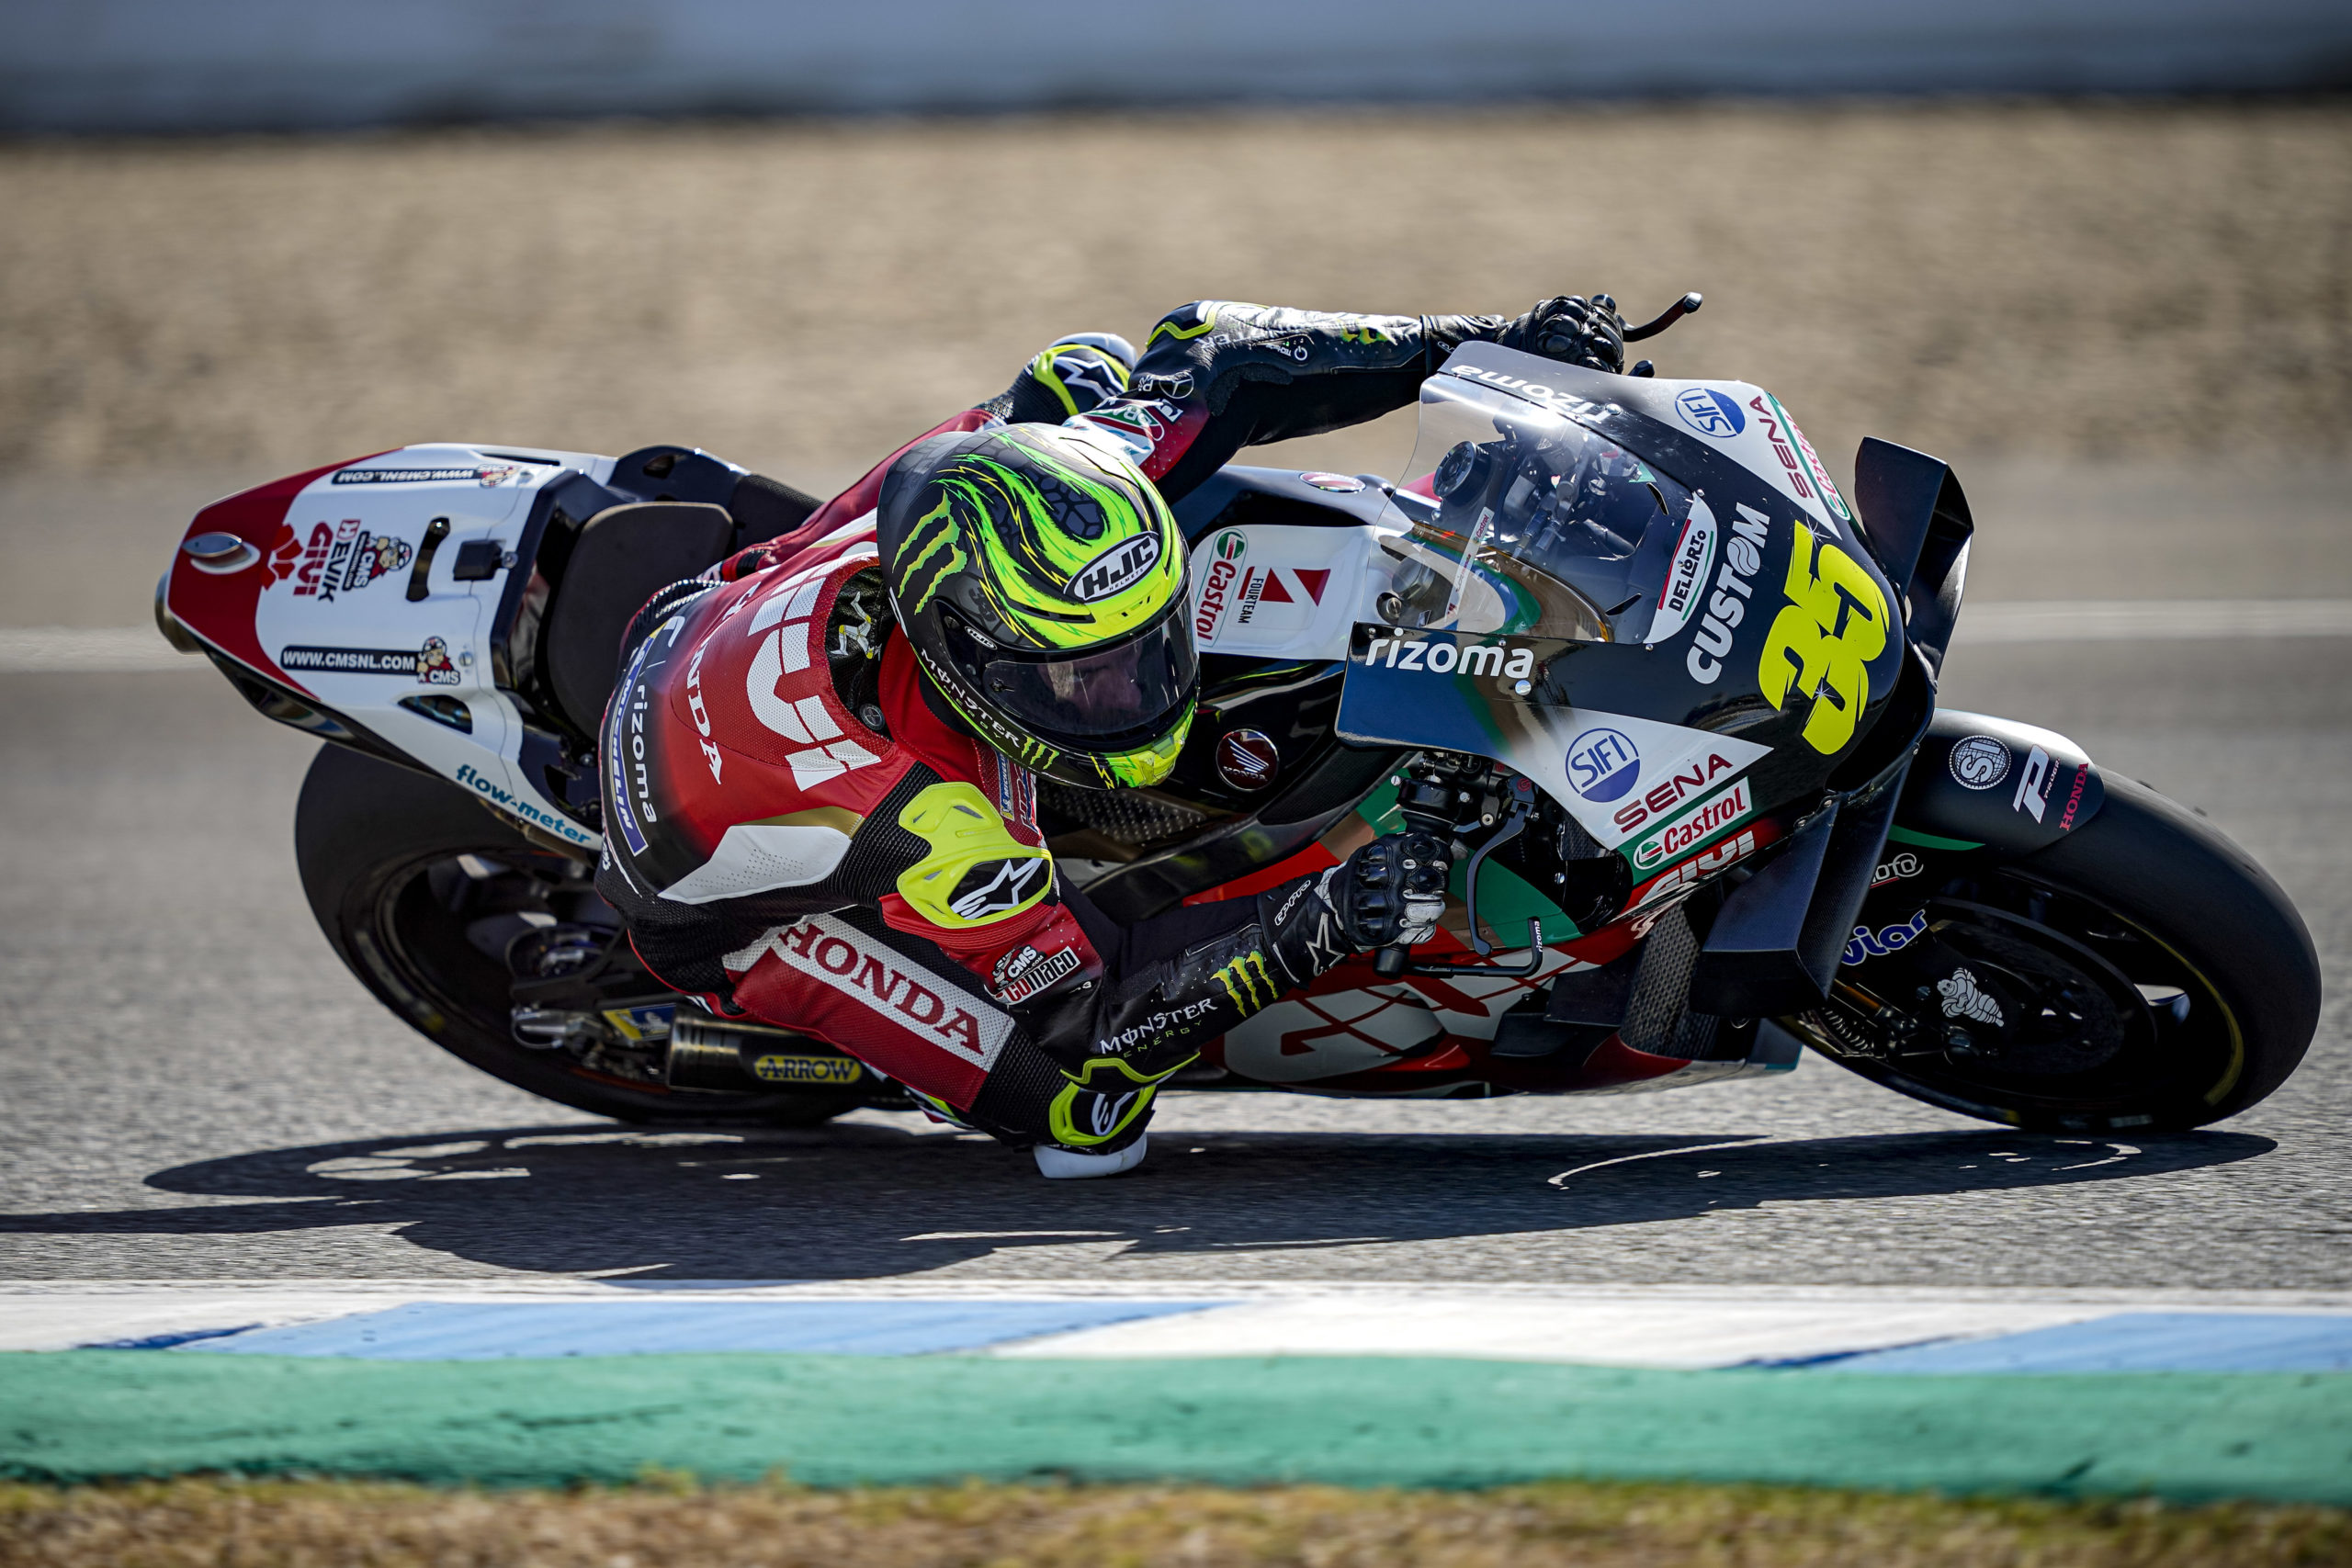 Cal Crutchlow, LCR-Honda, Jerez test 2020, MotoGP